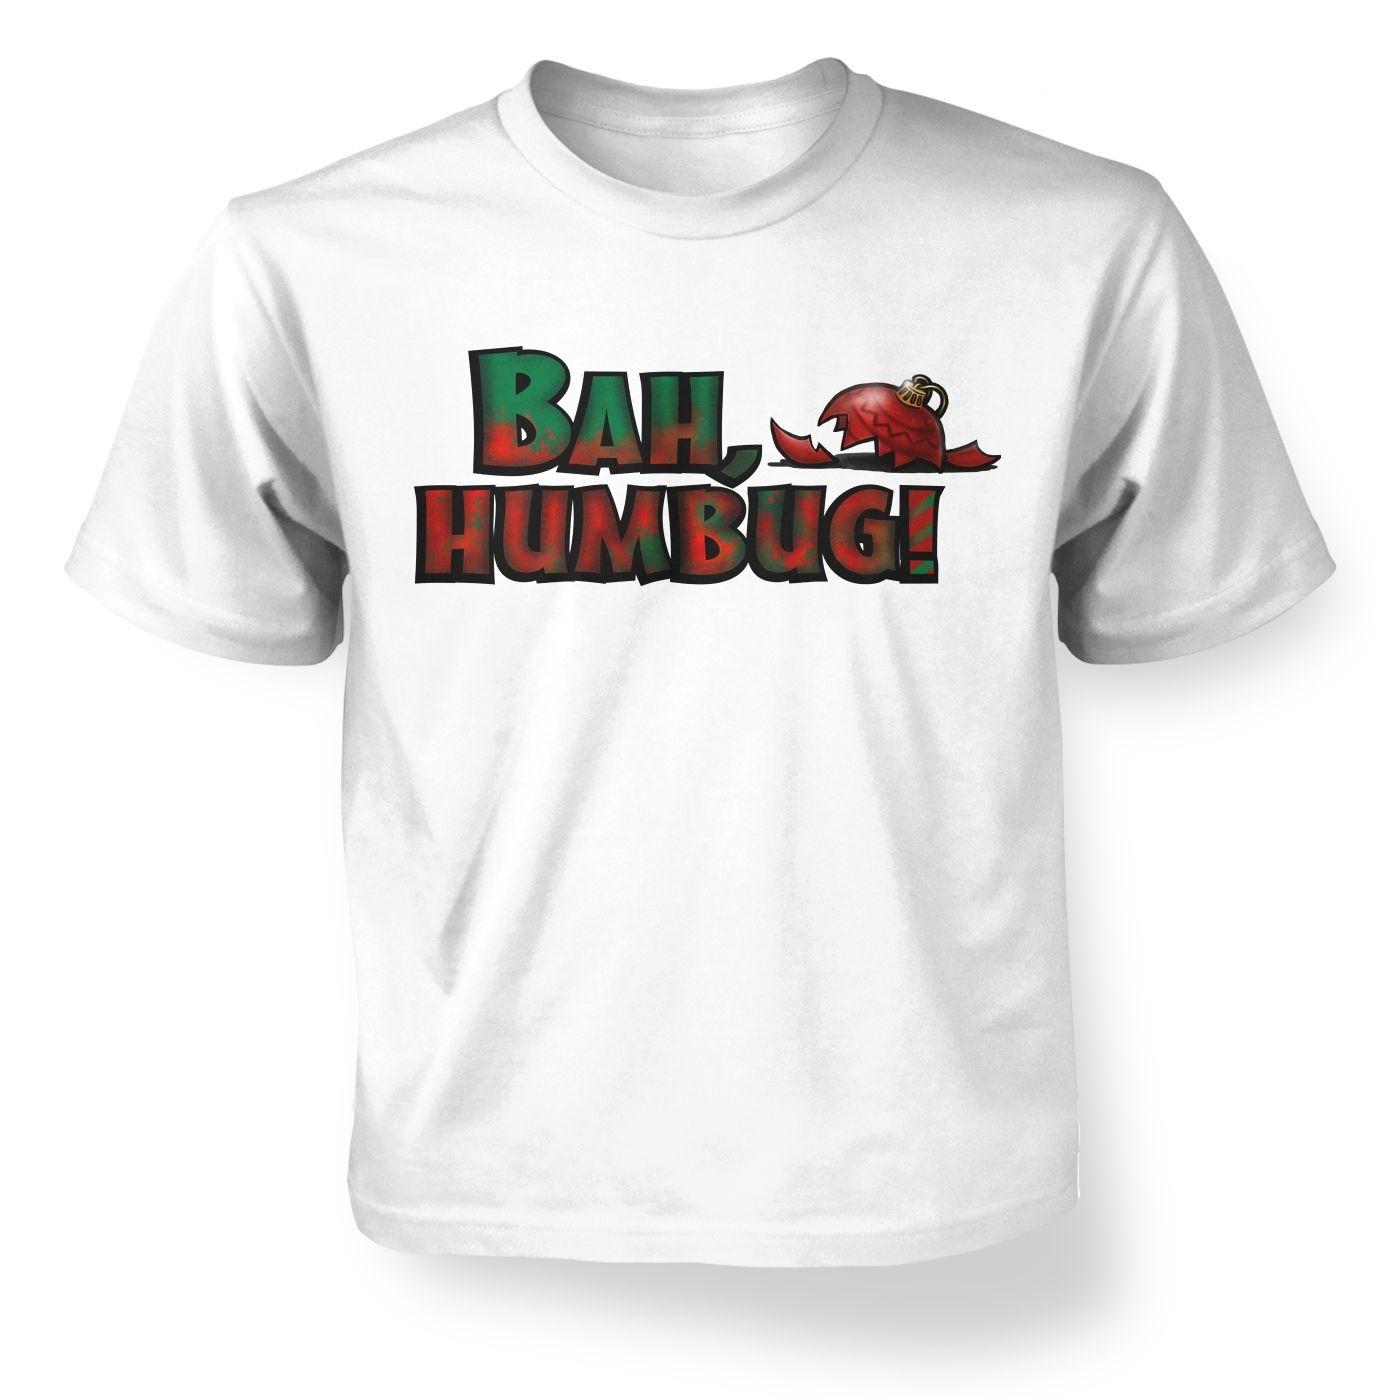 Bah humbug! Children's T-Shirt